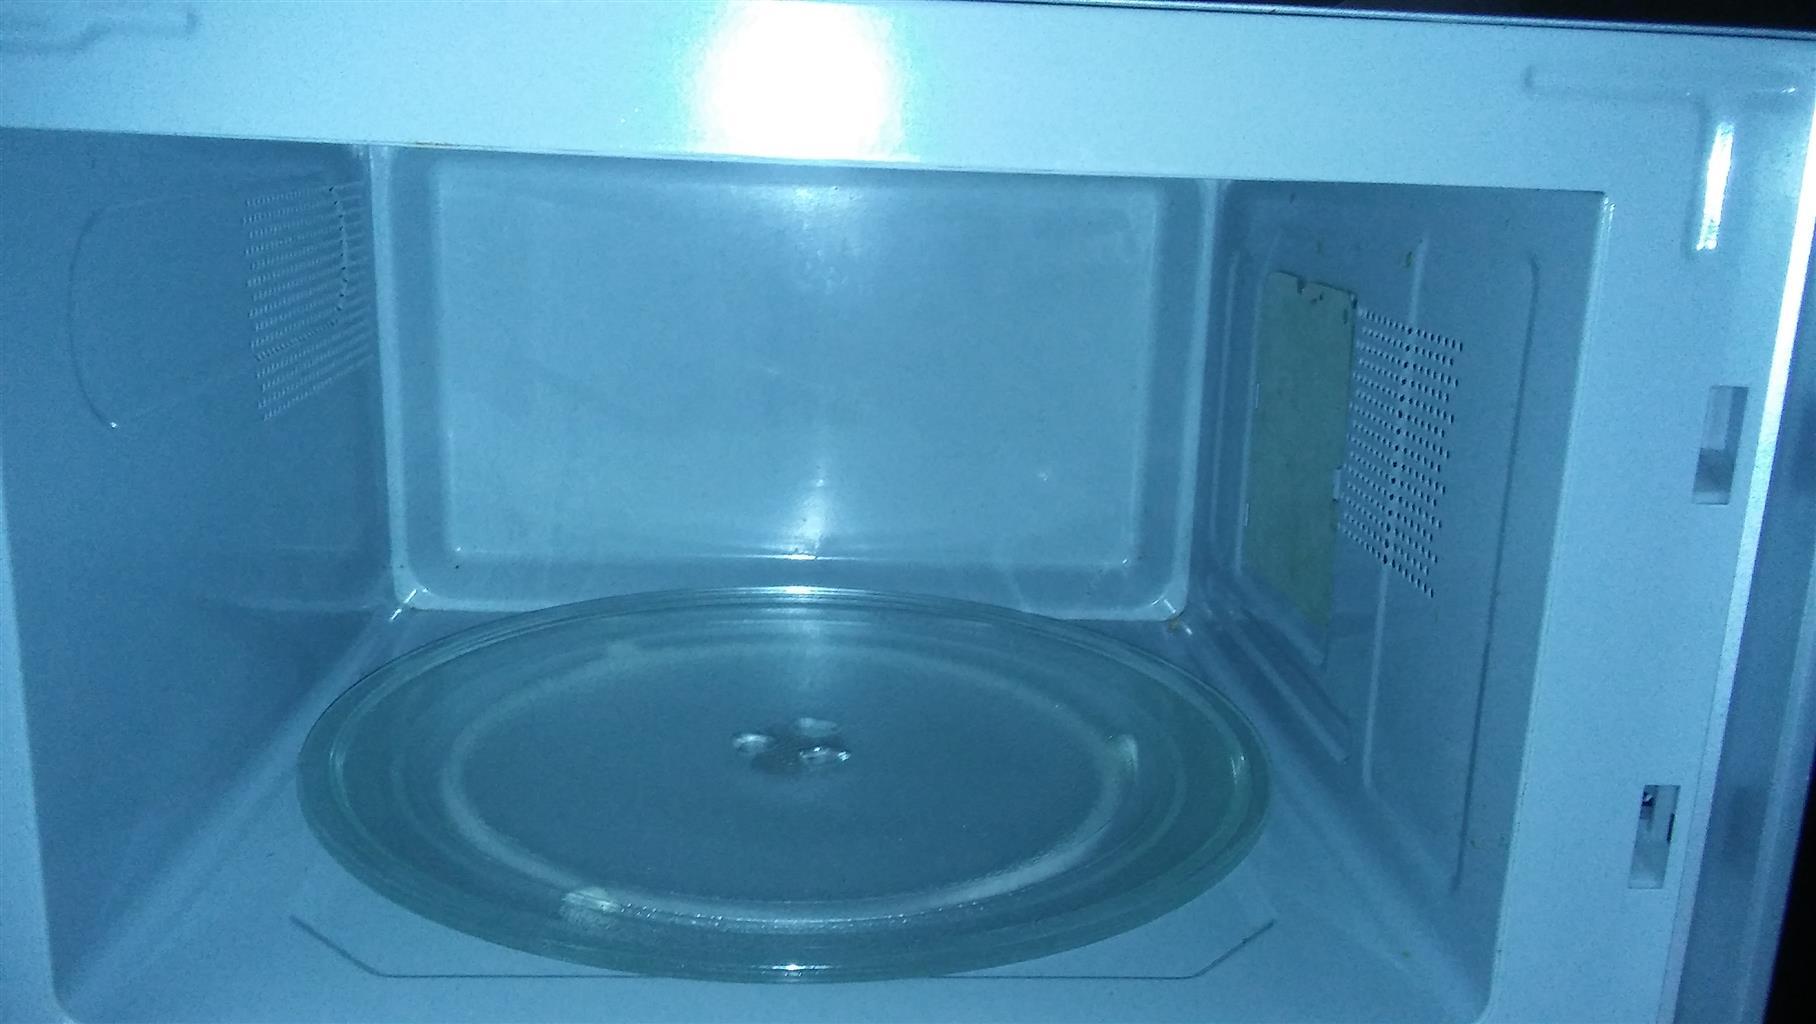 30L Defy Mirror Microwave & 4O inch Hisense Tv